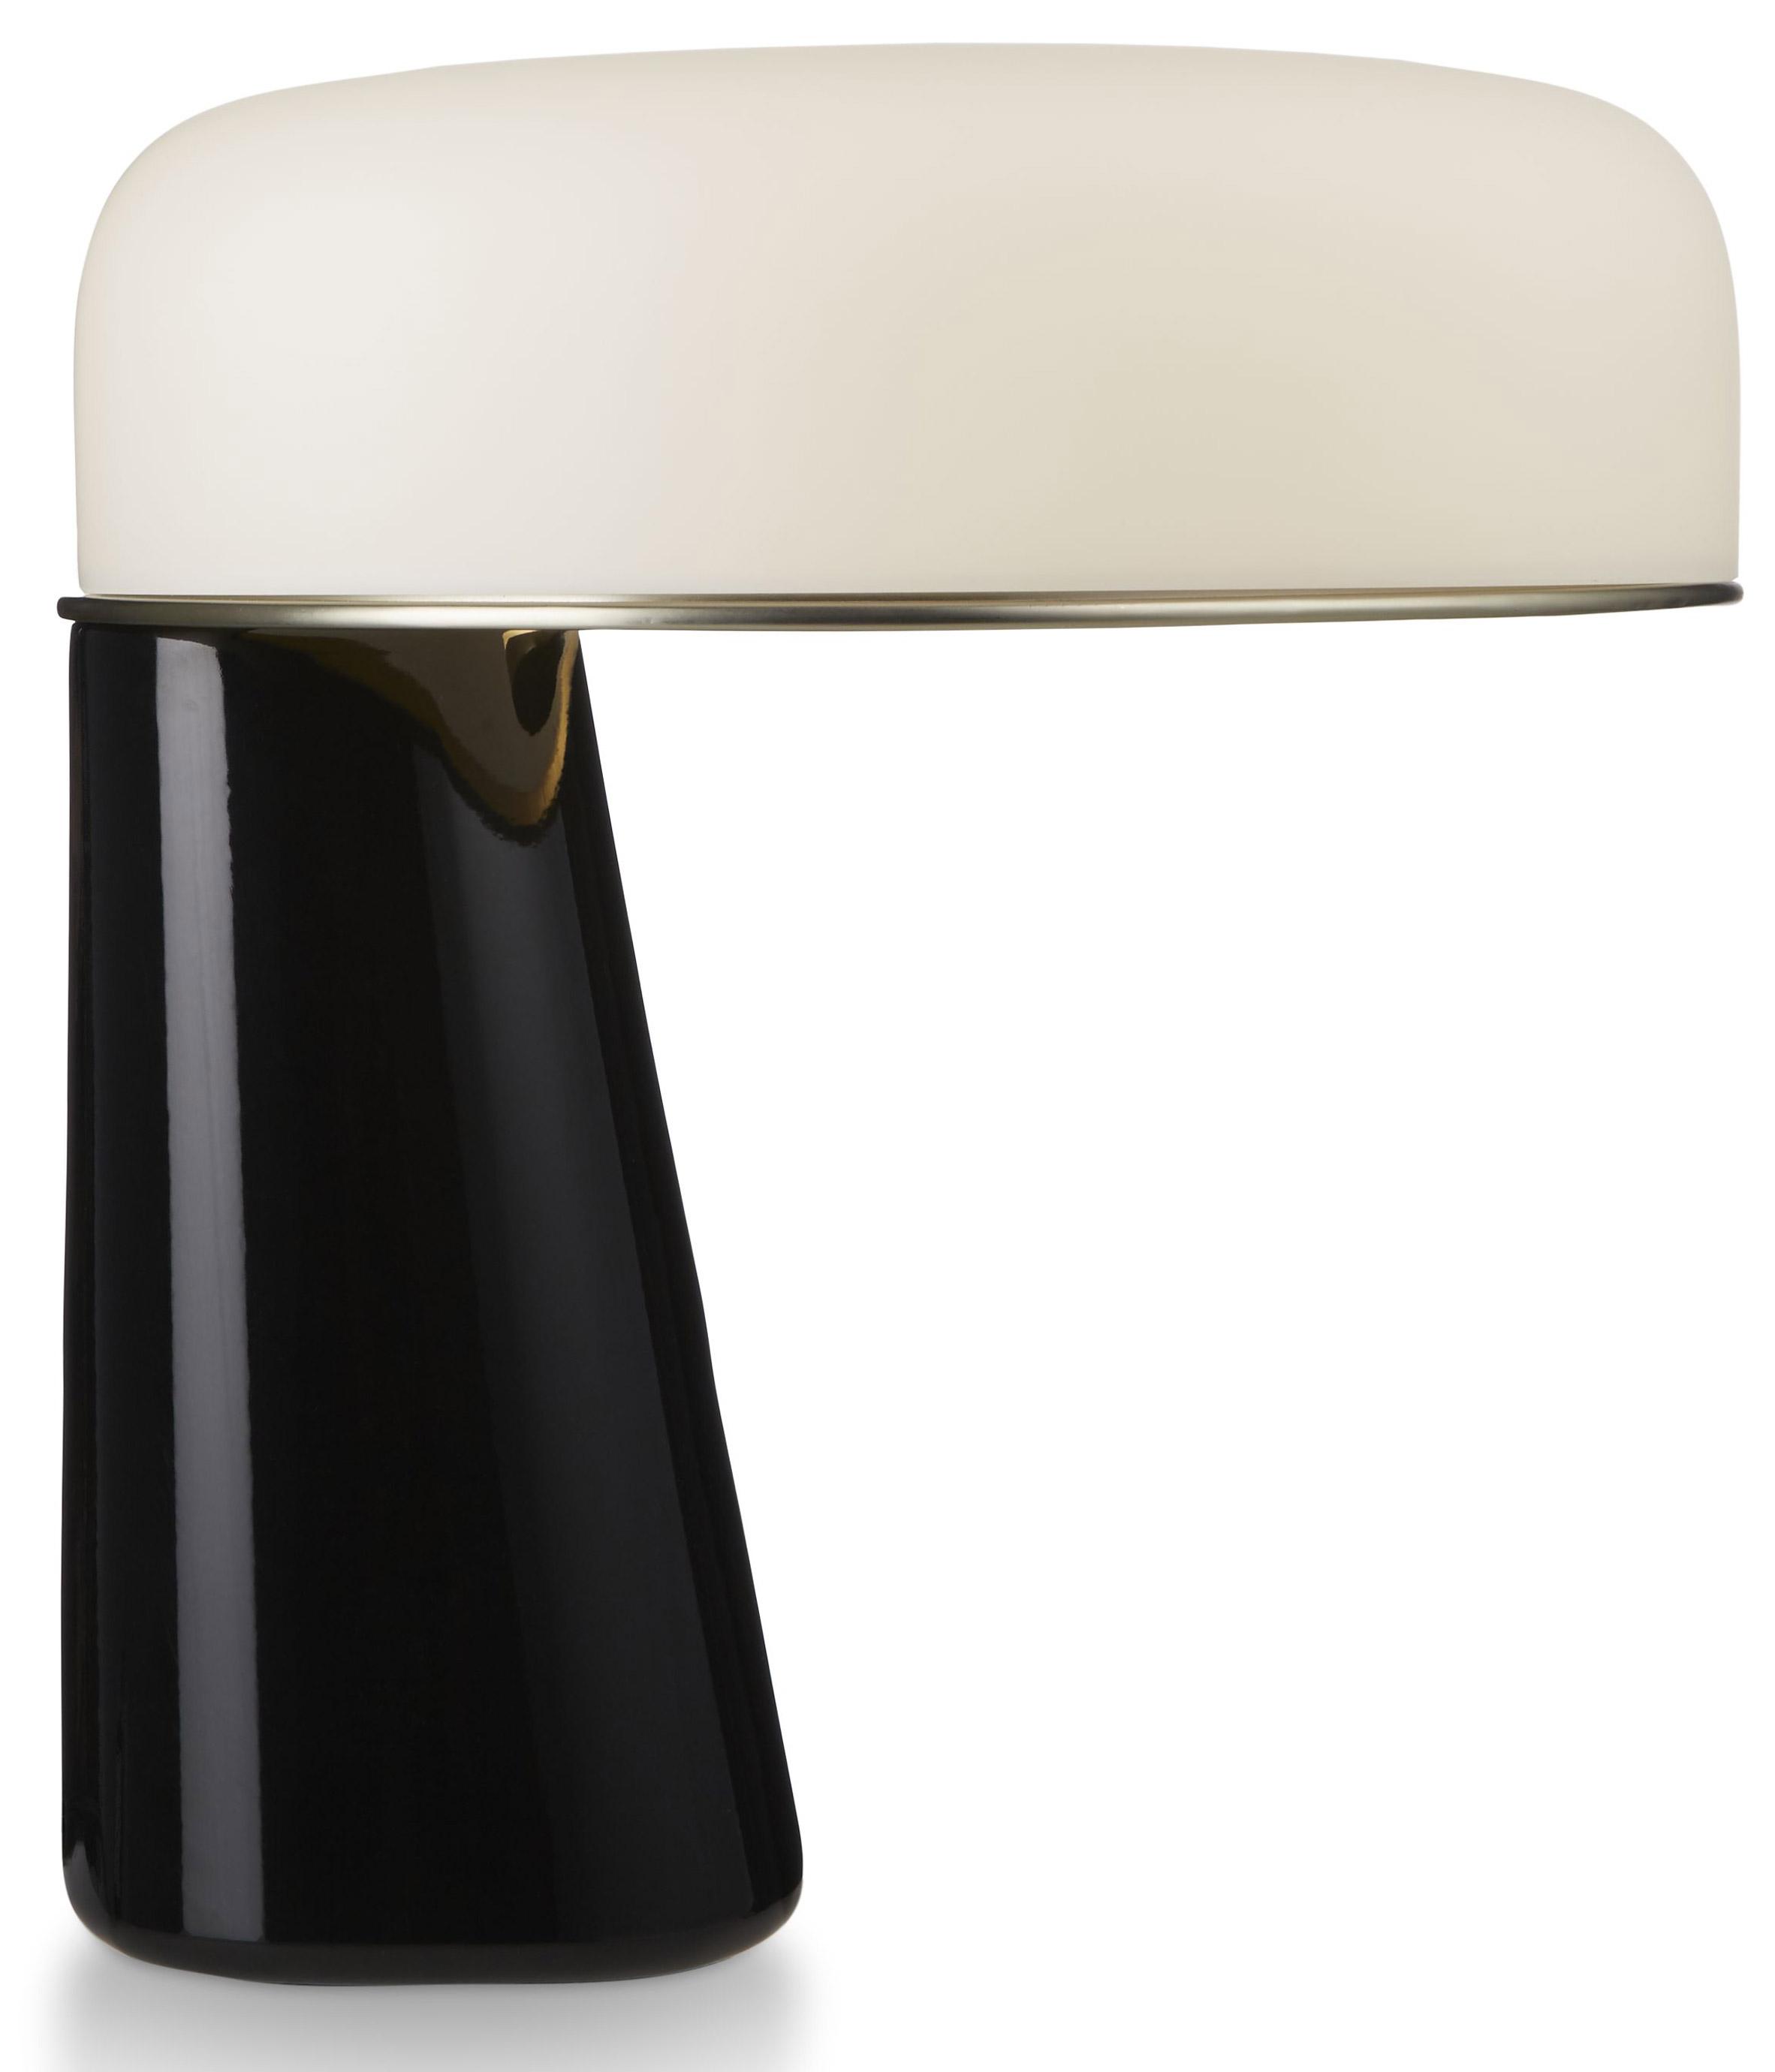 doshi-levien-furniture-collection-john-lewis-design_dezeen_2364_col_1